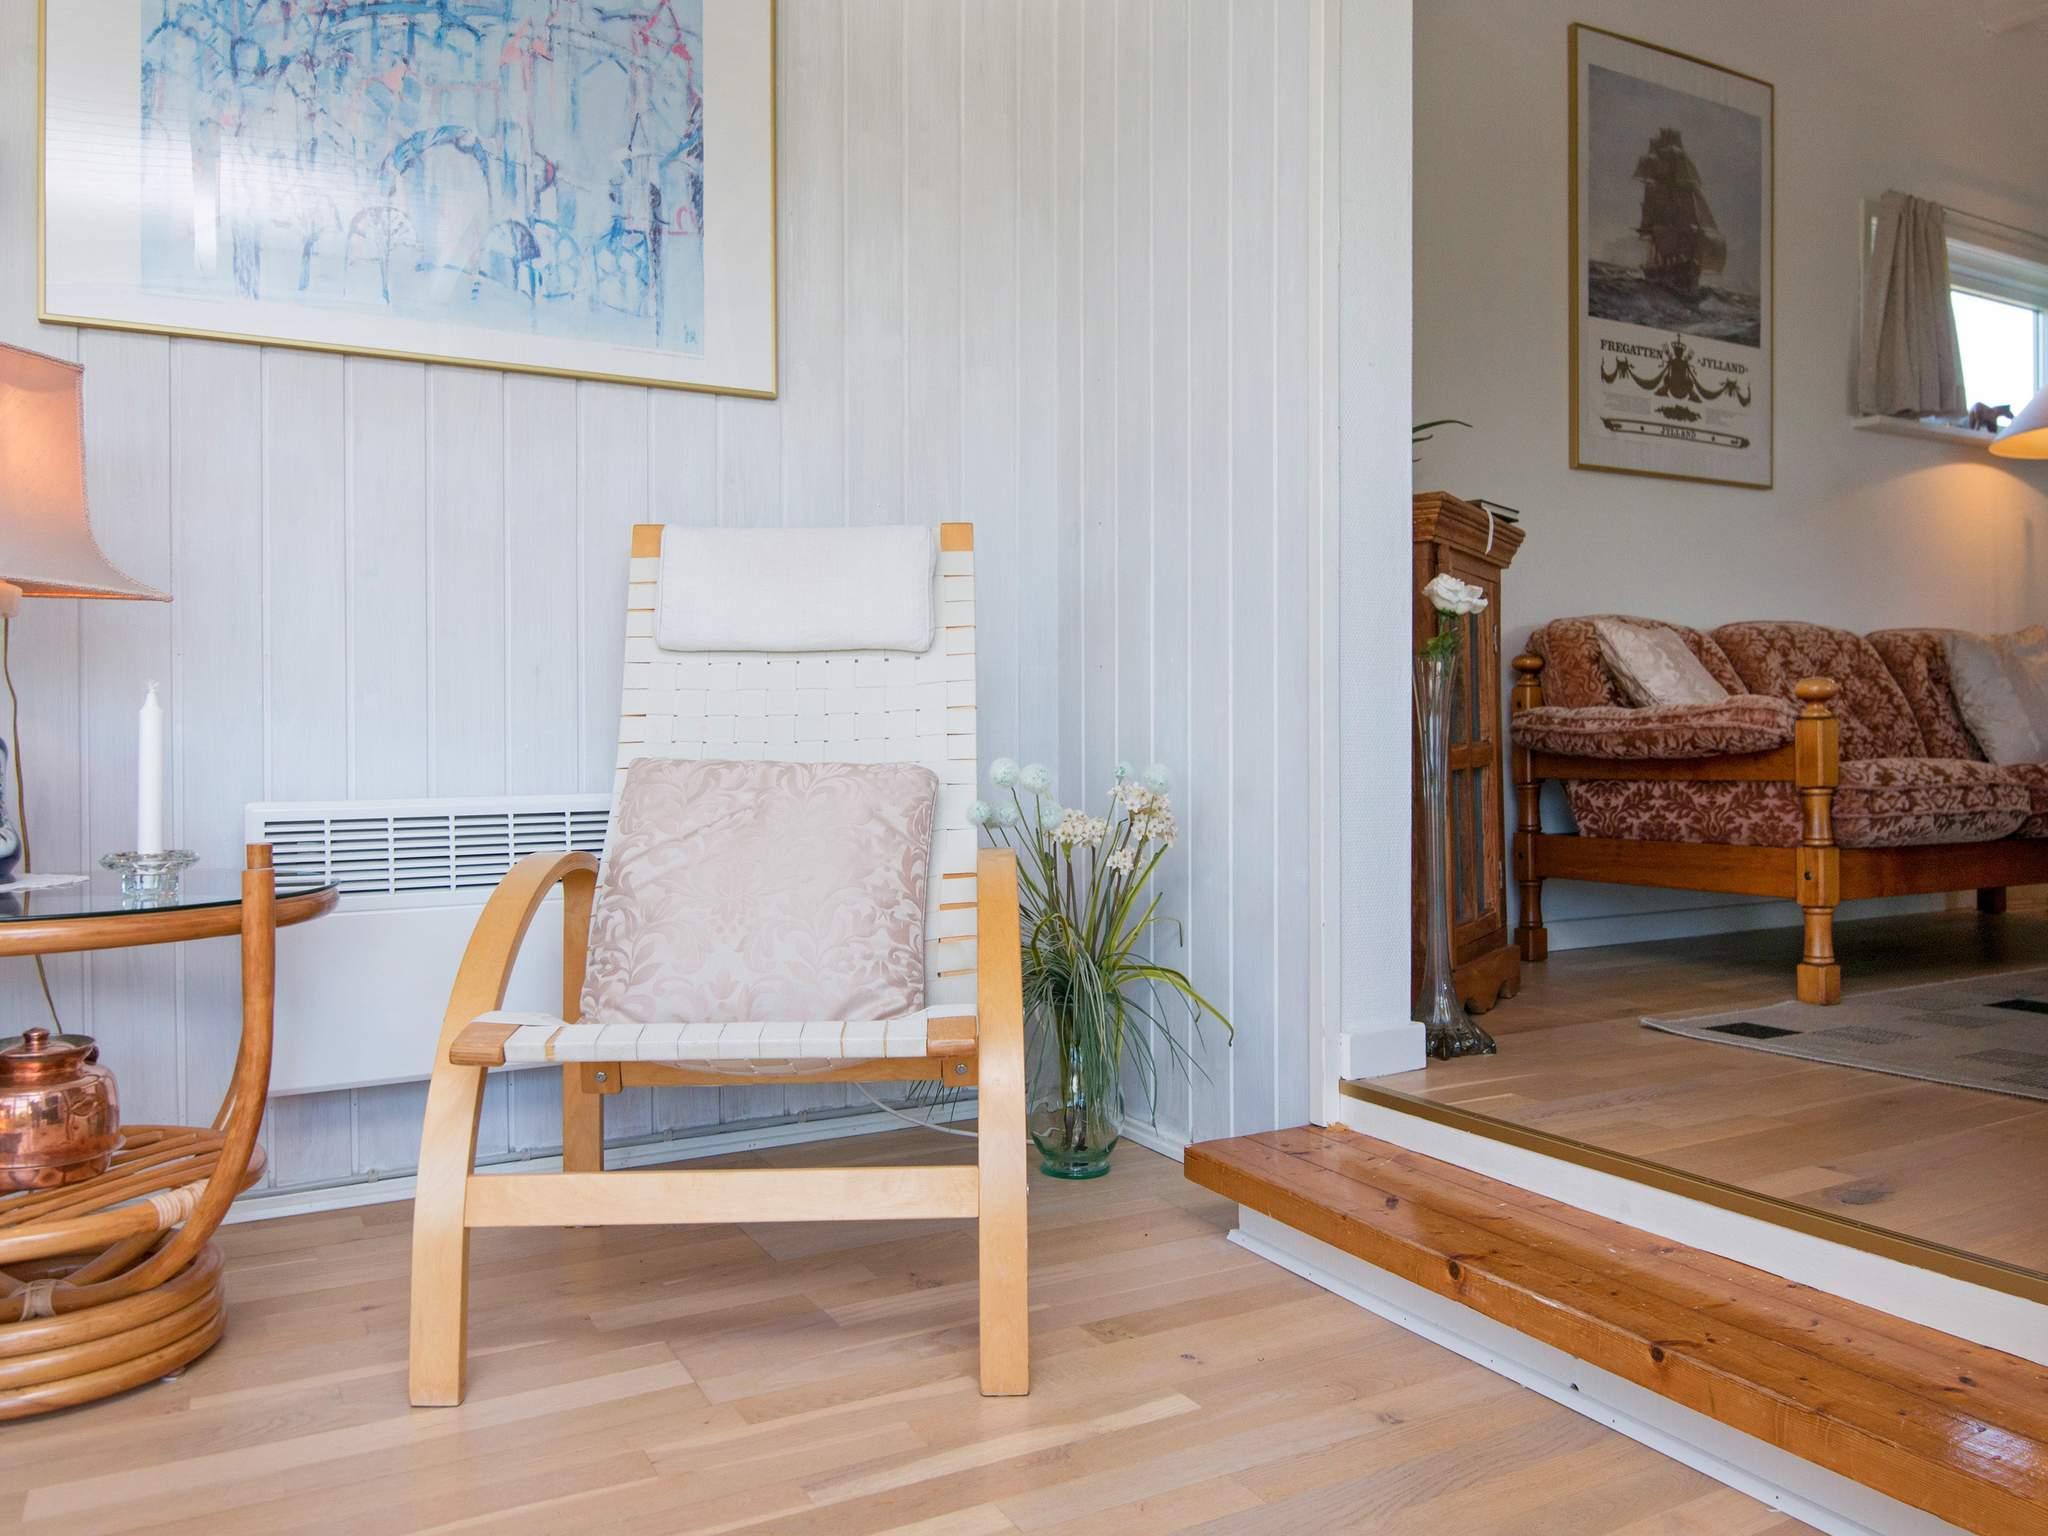 Ferienhaus Lyngsbæk Strand (493402), Ebeltoft, , Ostjütland, Dänemark, Bild 3